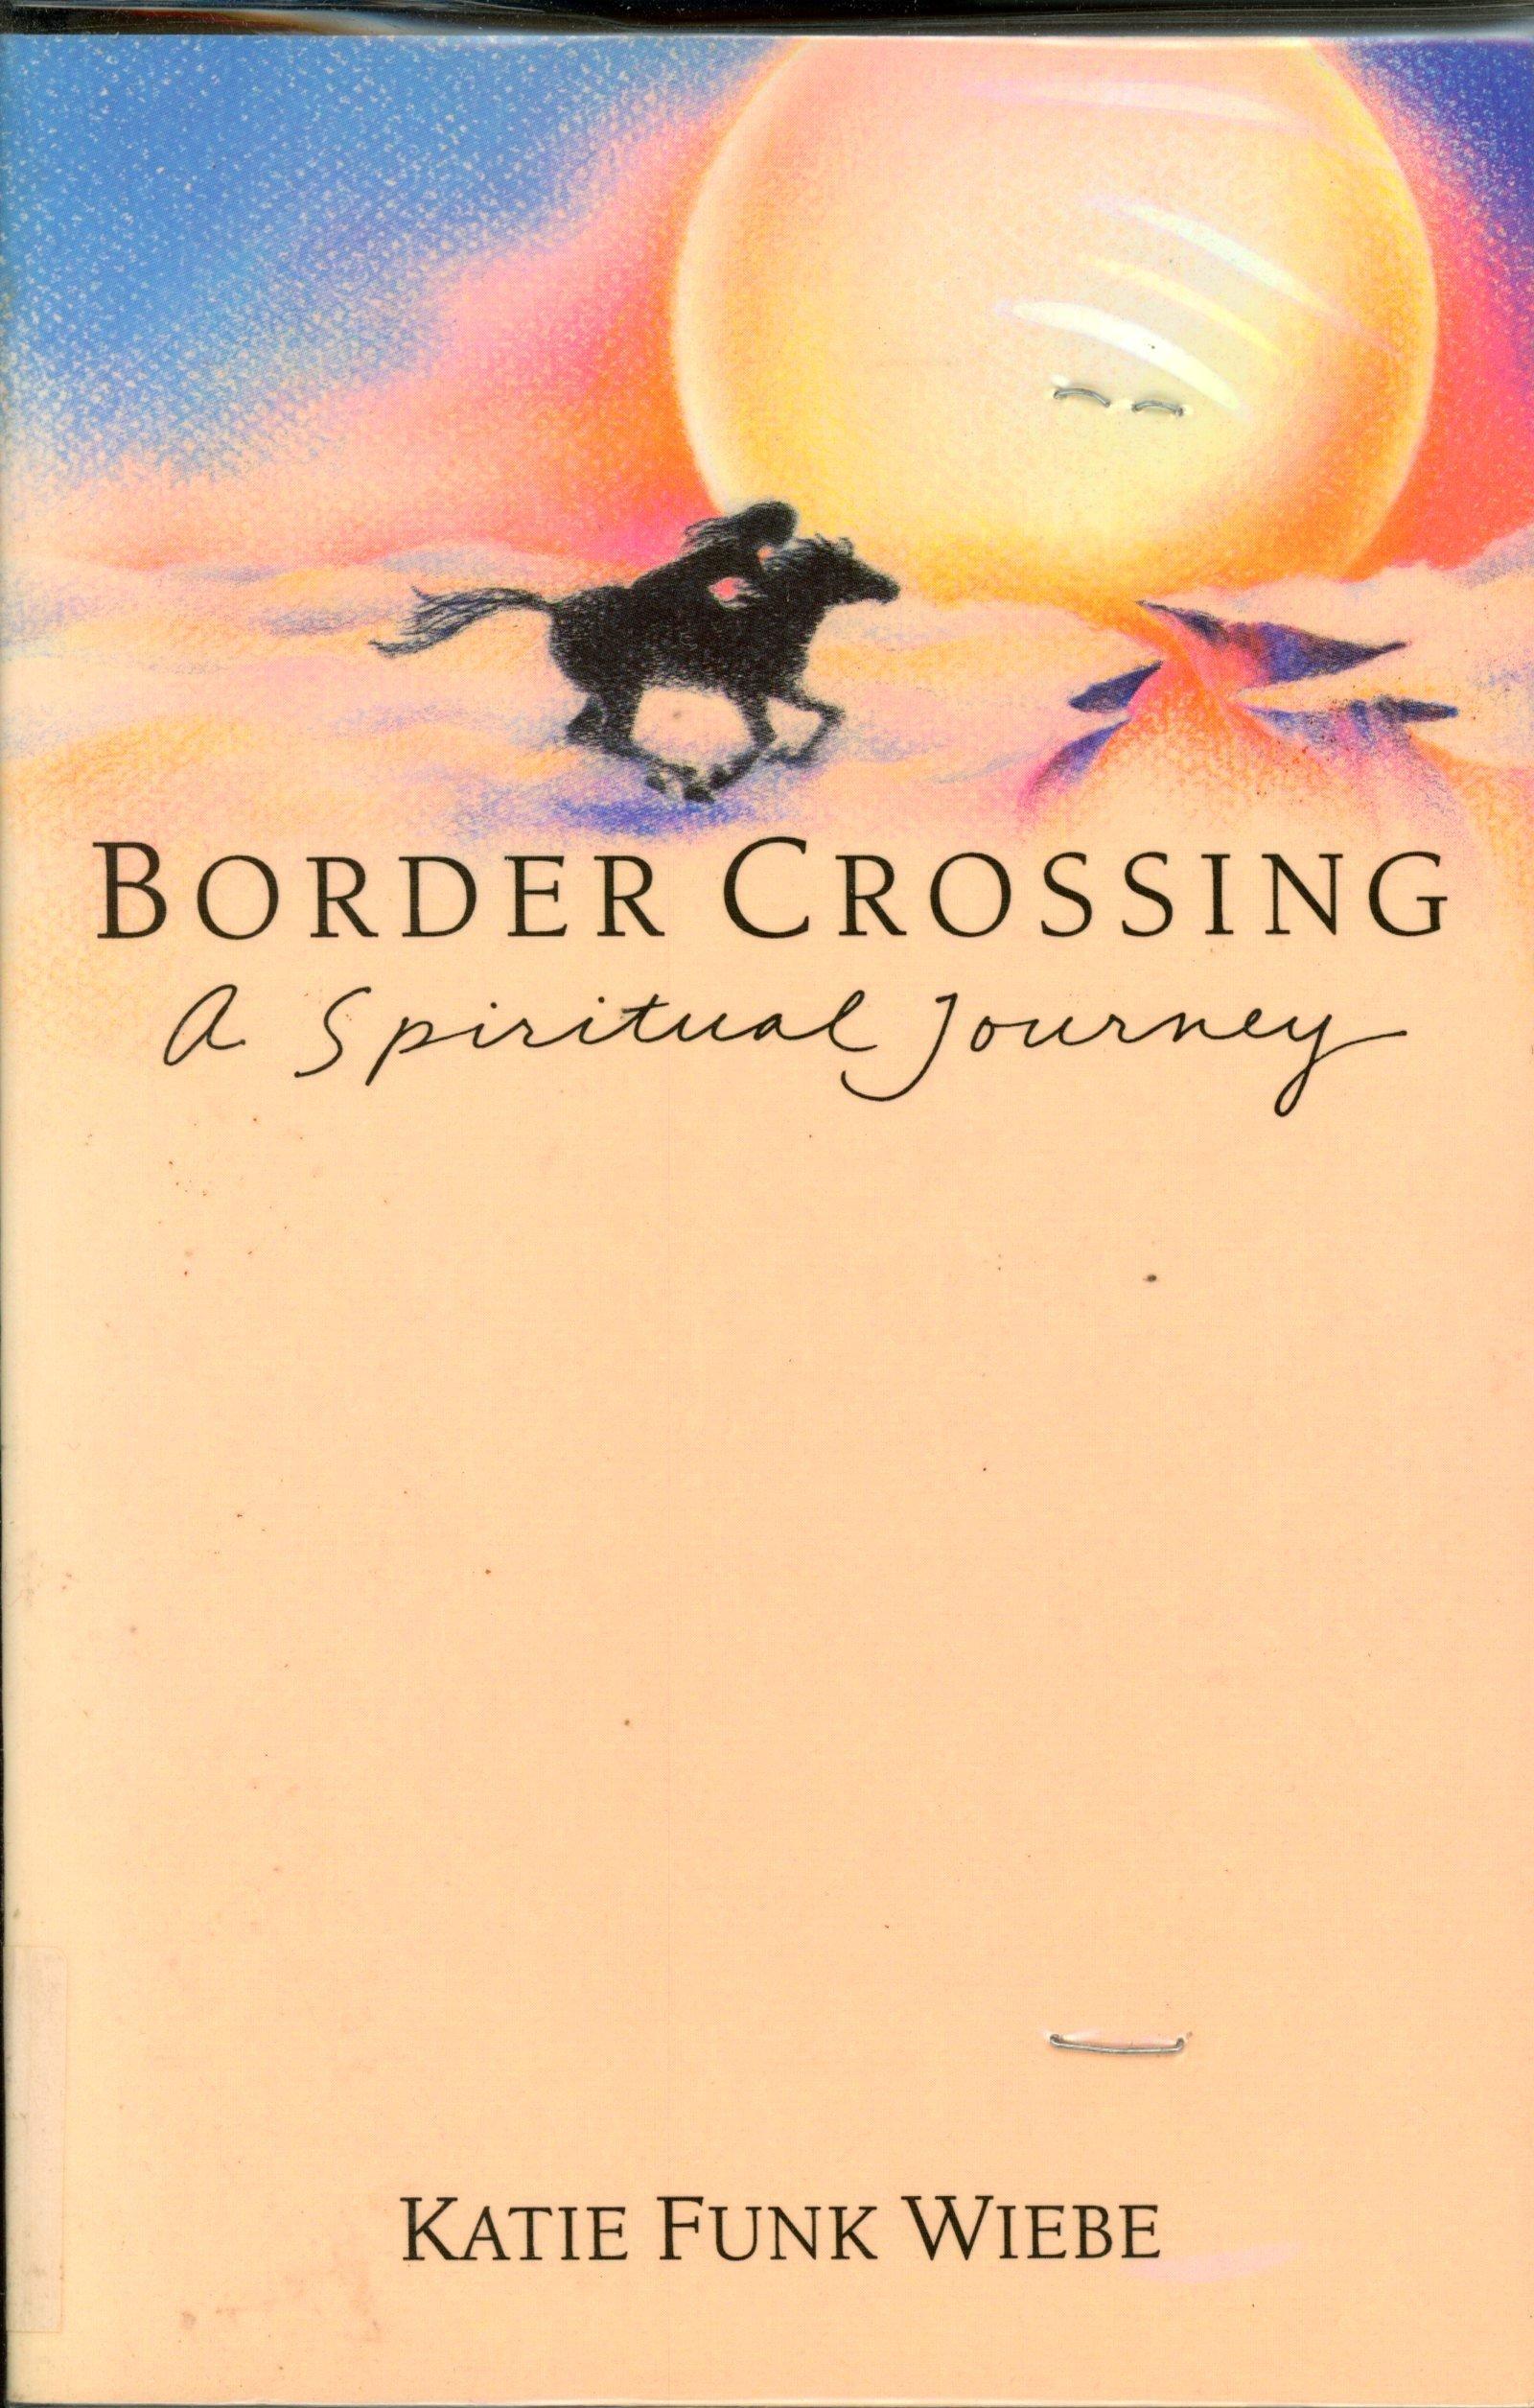 Border Crossing: A Spiritual Journey